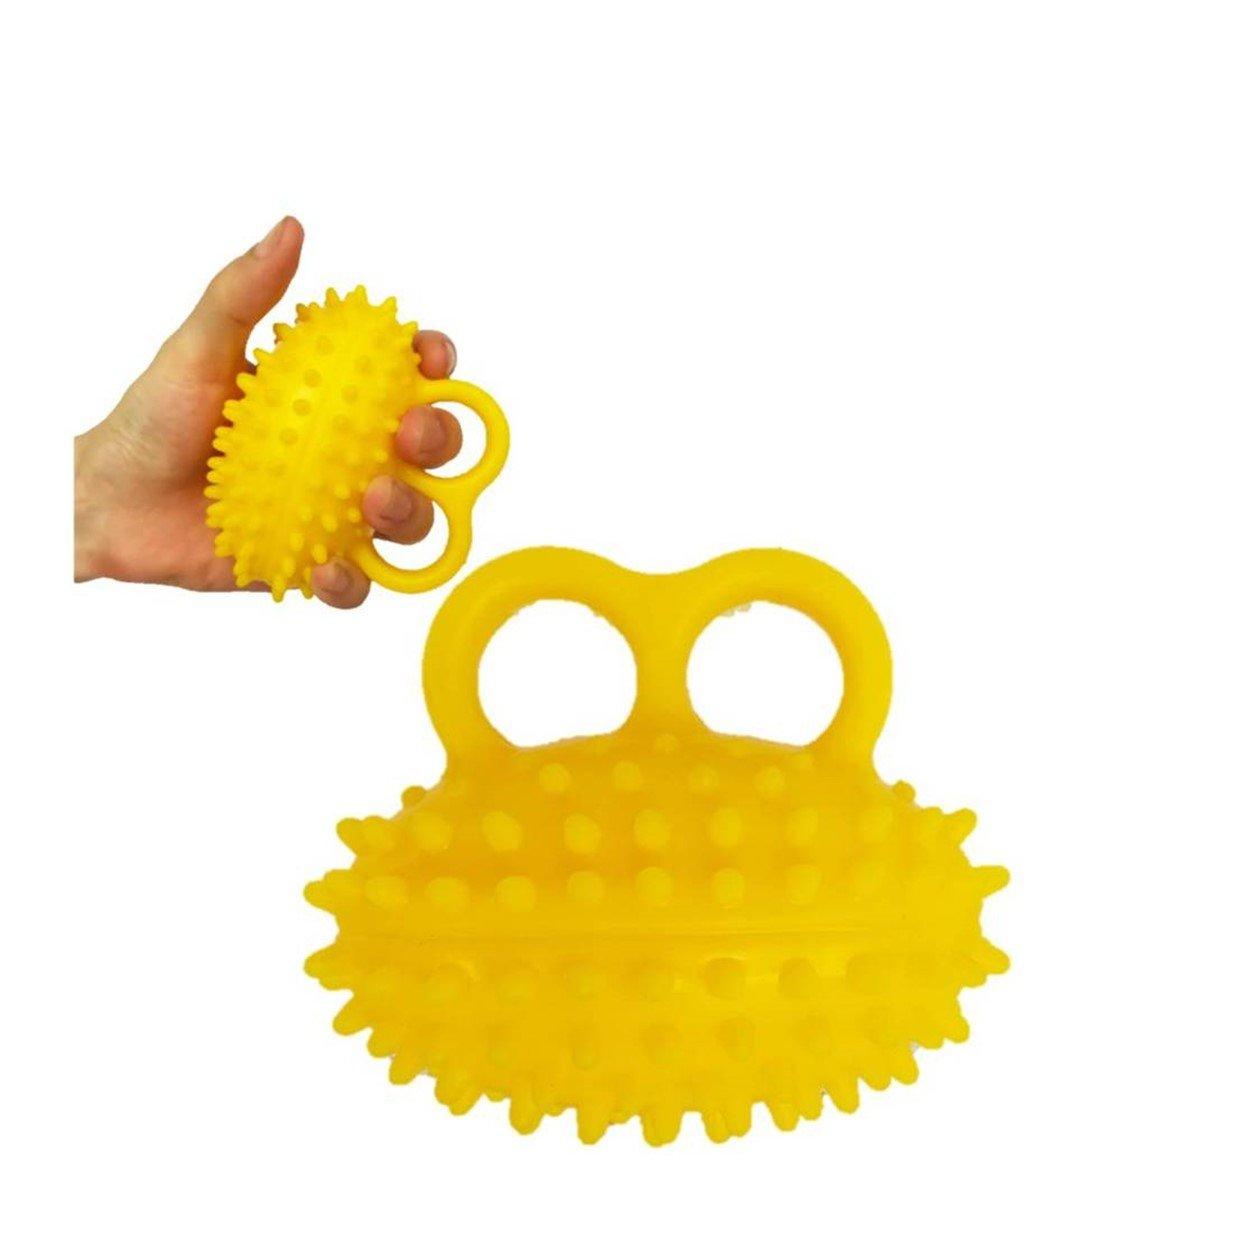 Hand Exercise Balls, Therapy Finger Grip Strengthener,Elderly Exercise Hand Grip Wrist Force Gripping Ball Finger Strength Rehabilitation Training Equipment